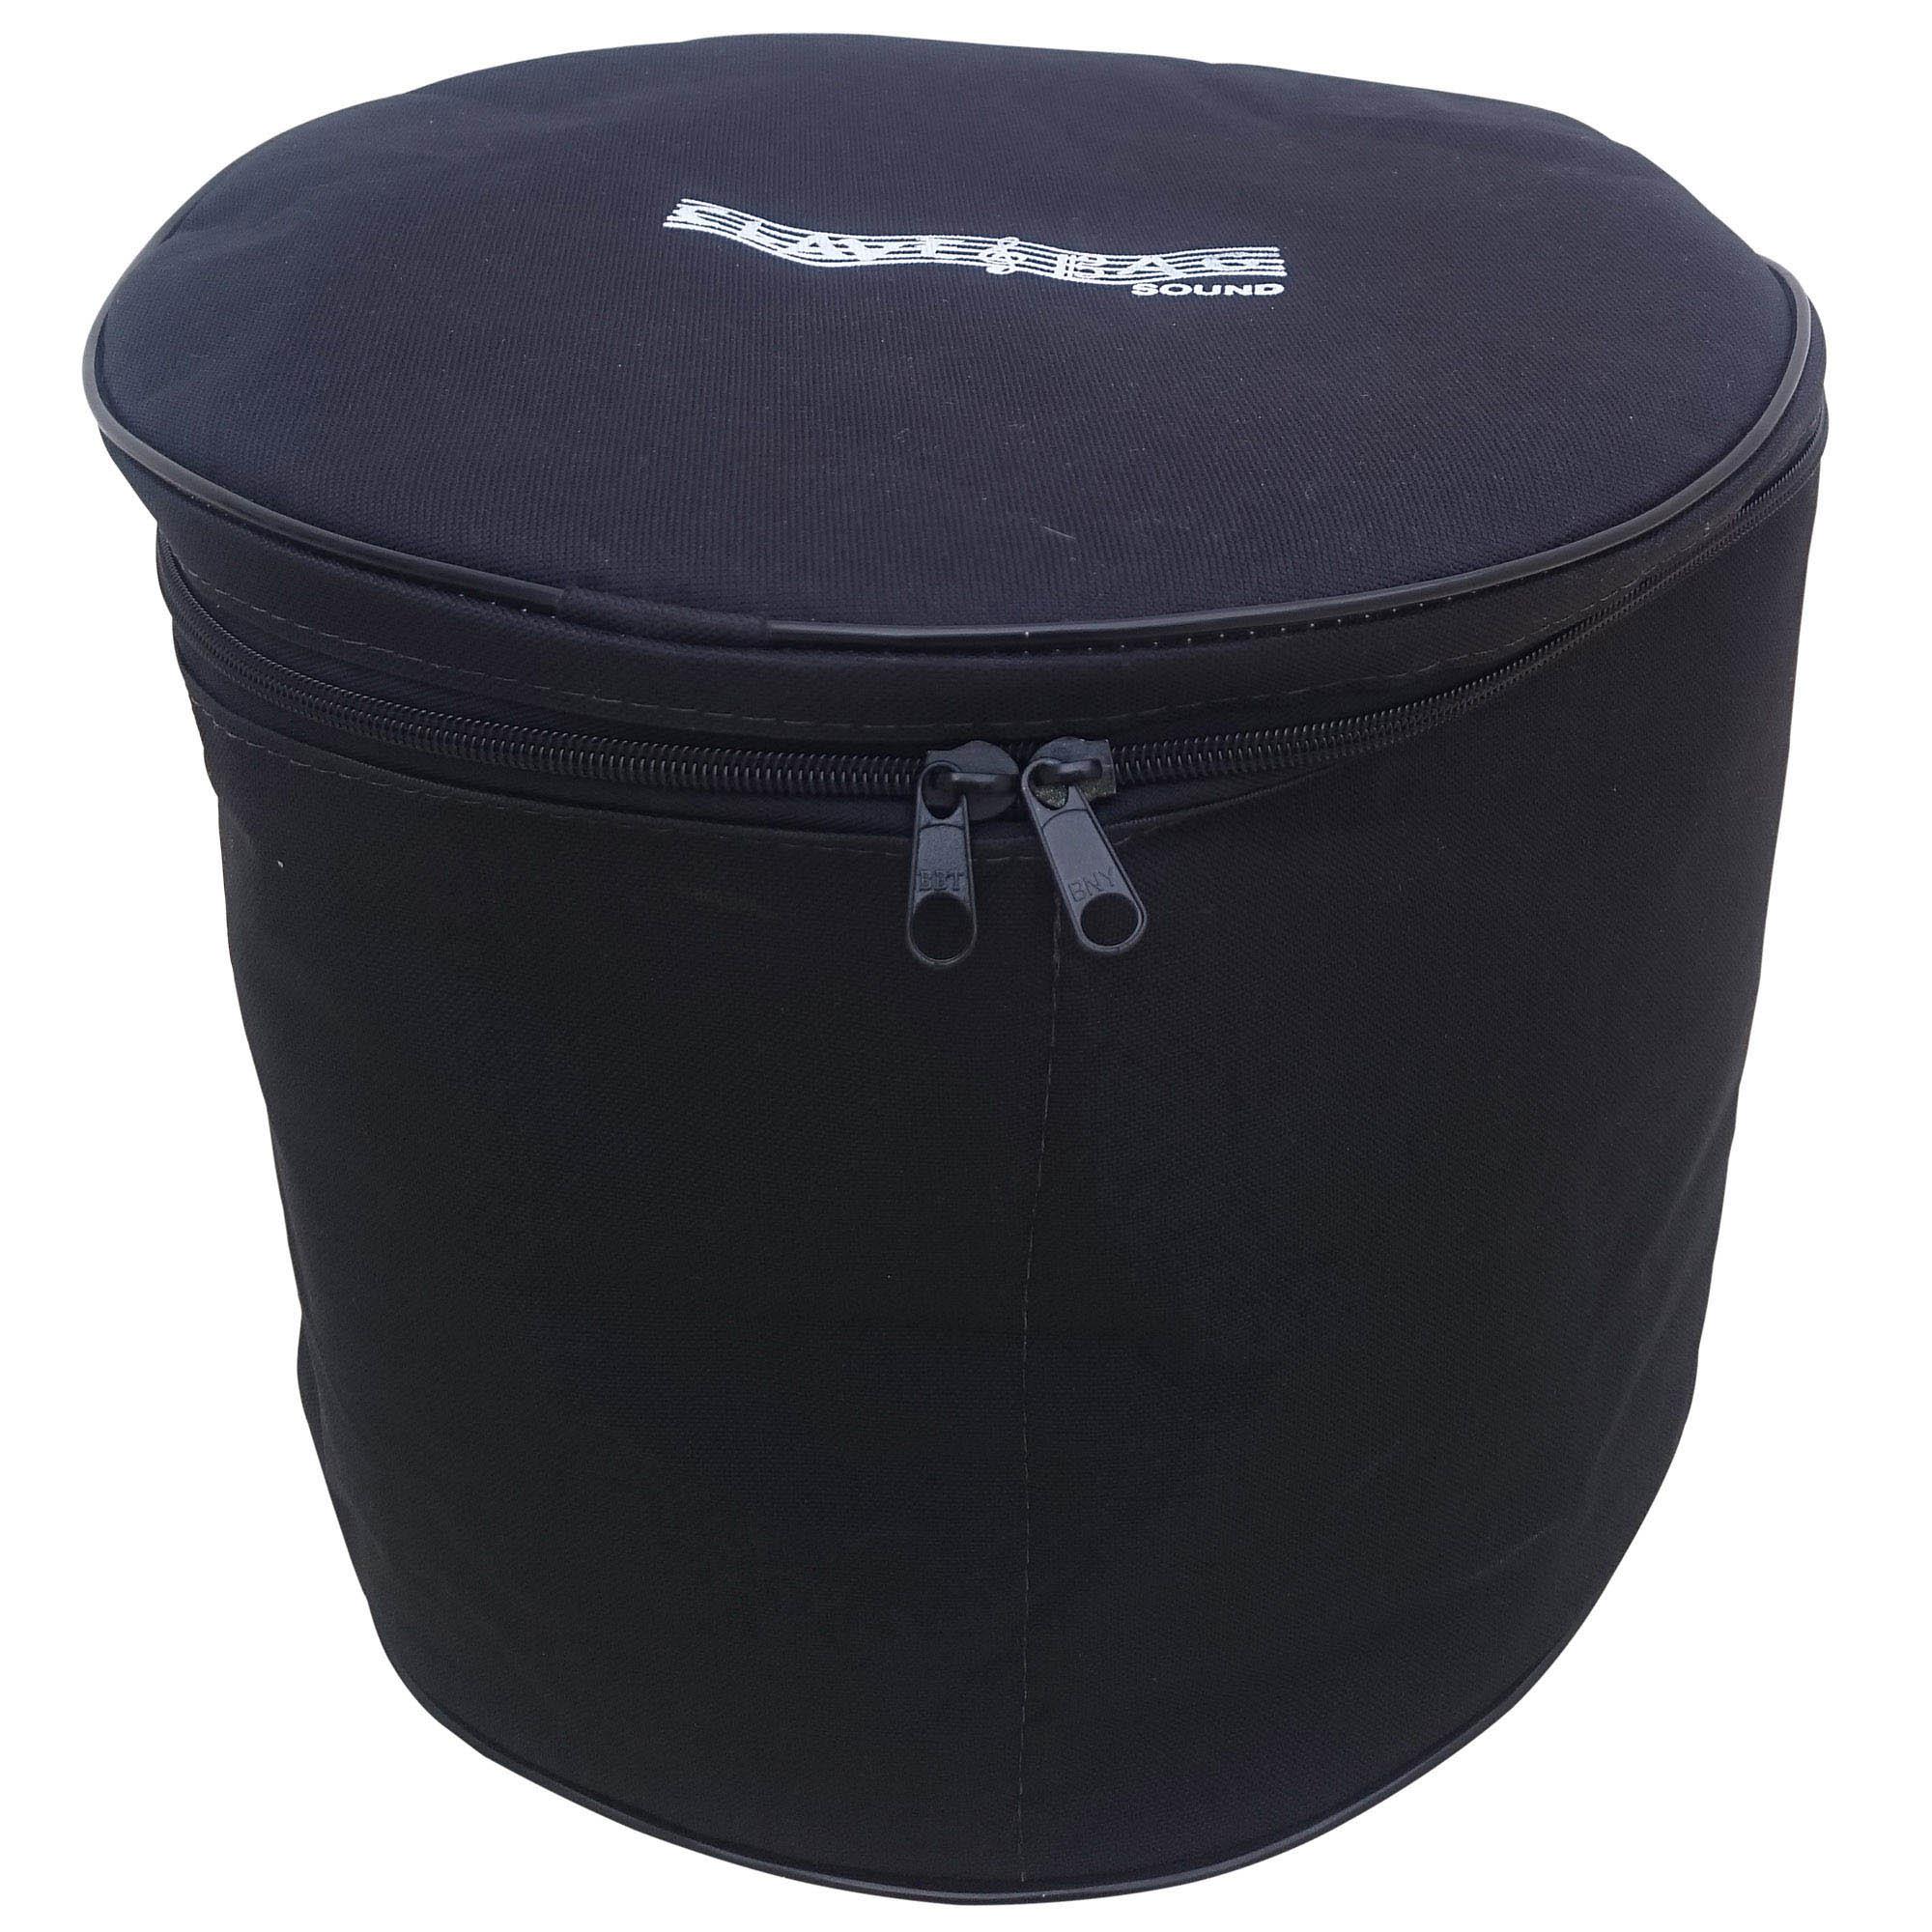 "Capa Bag Extra Luxo para Surdo 14"" para Bateria CLAVE & BAG. Totalmente acolchoado"